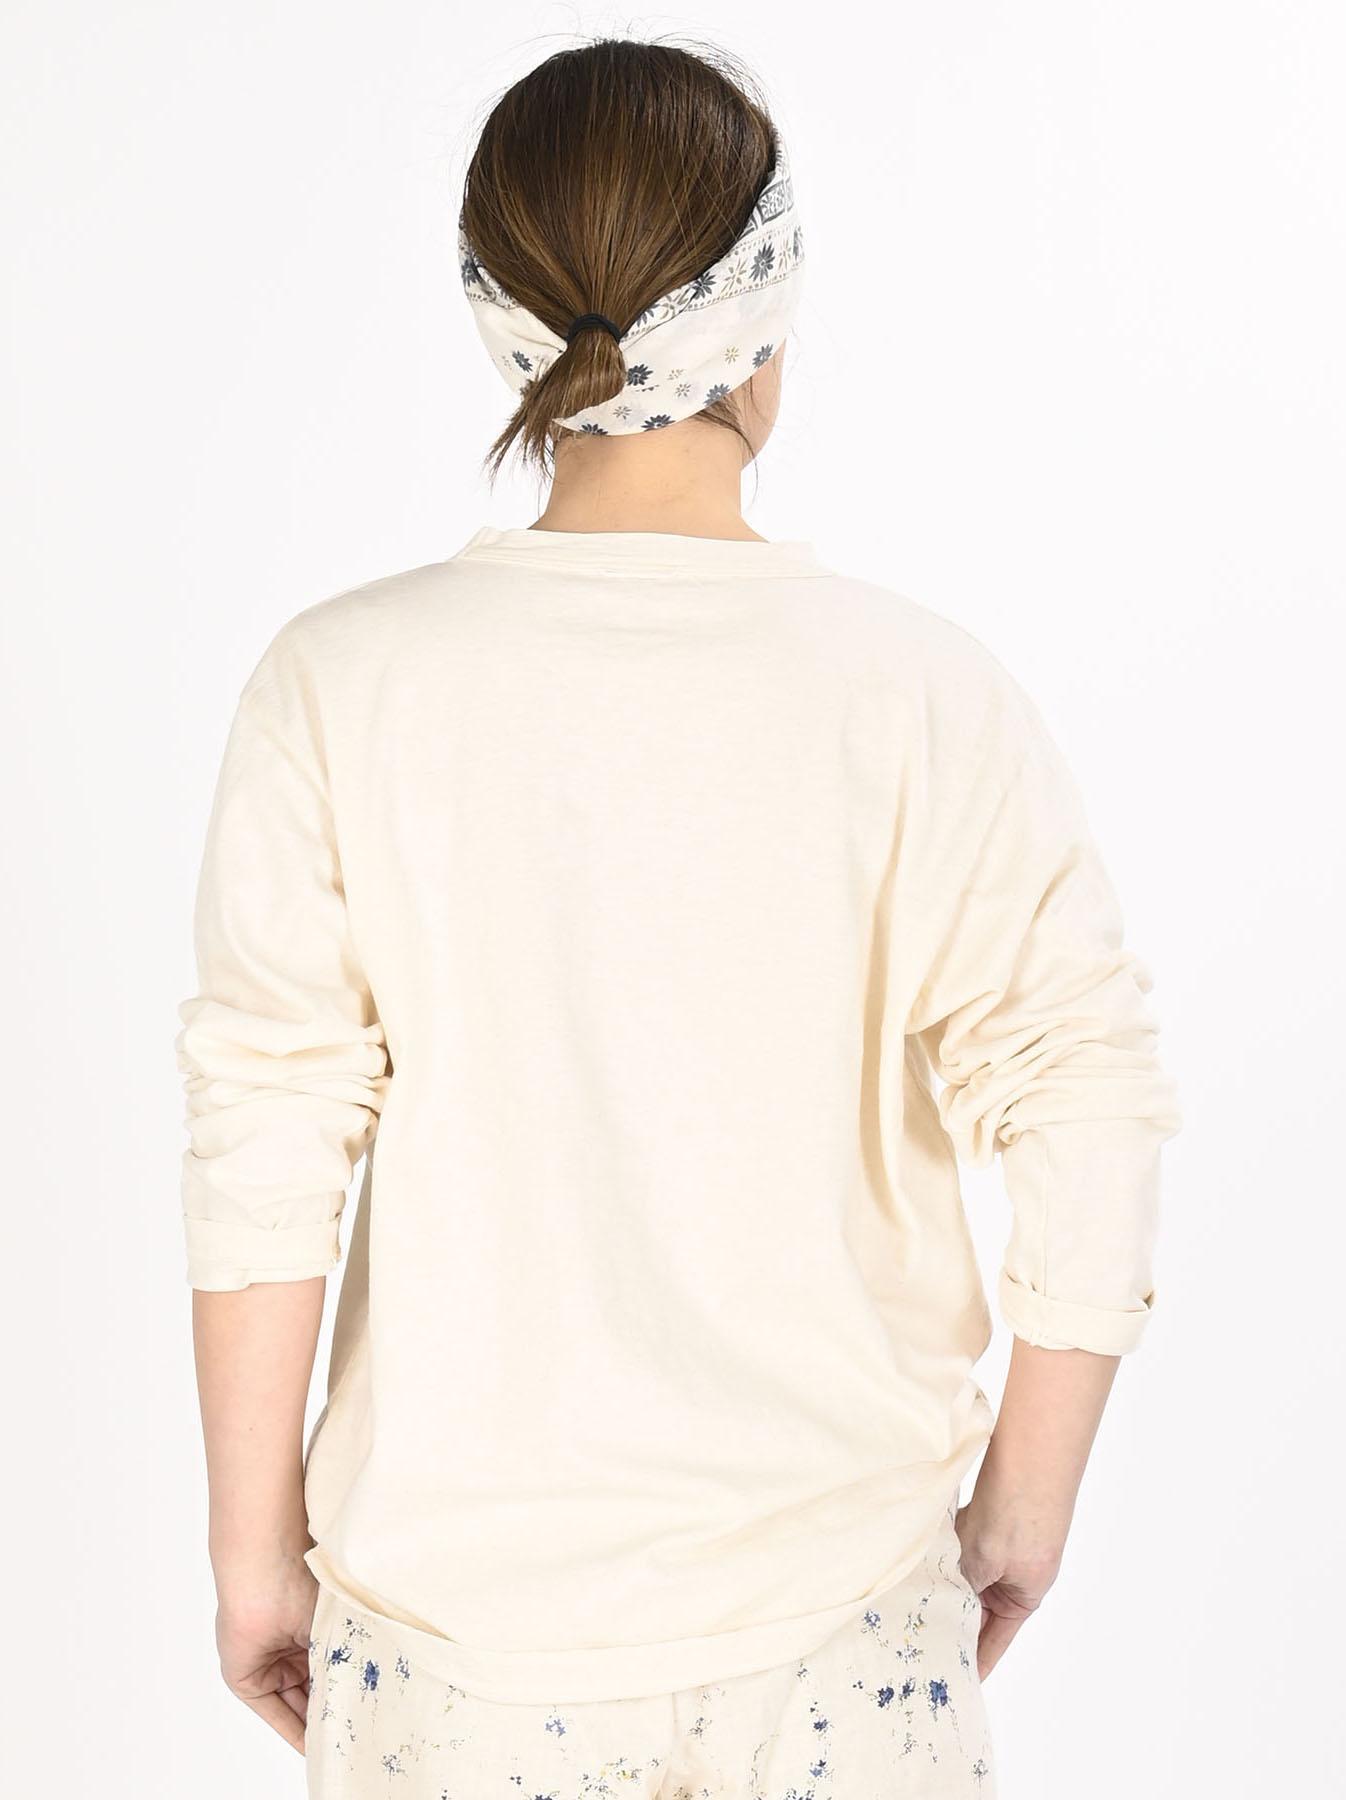 Zimbabwe Cotton 908 Ocean Long-sleeved T-shirt-9